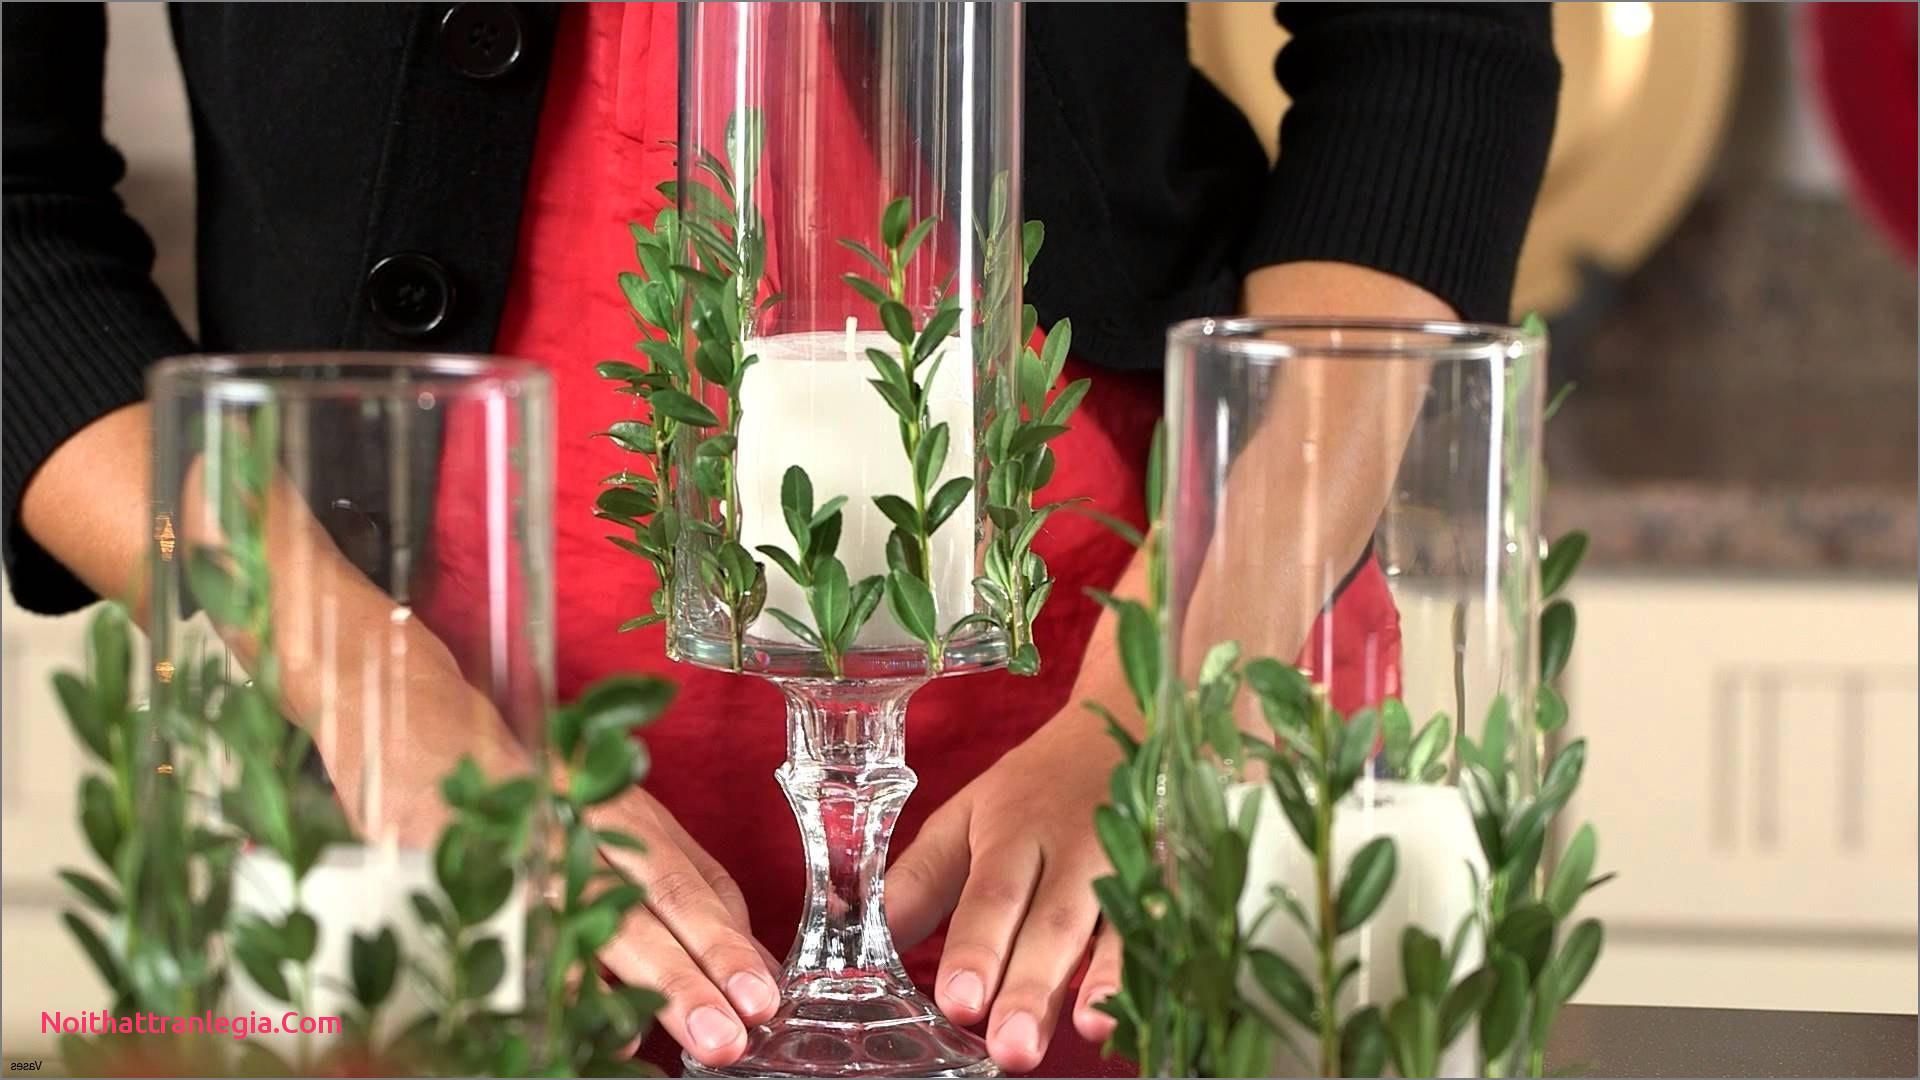 silver rectangle vase of 20 wedding vases noithattranlegia vases design pertaining to wedding centerpiece decoration ideas unique dollar tree wedding decorations awesome h vases dollar vase i 0d